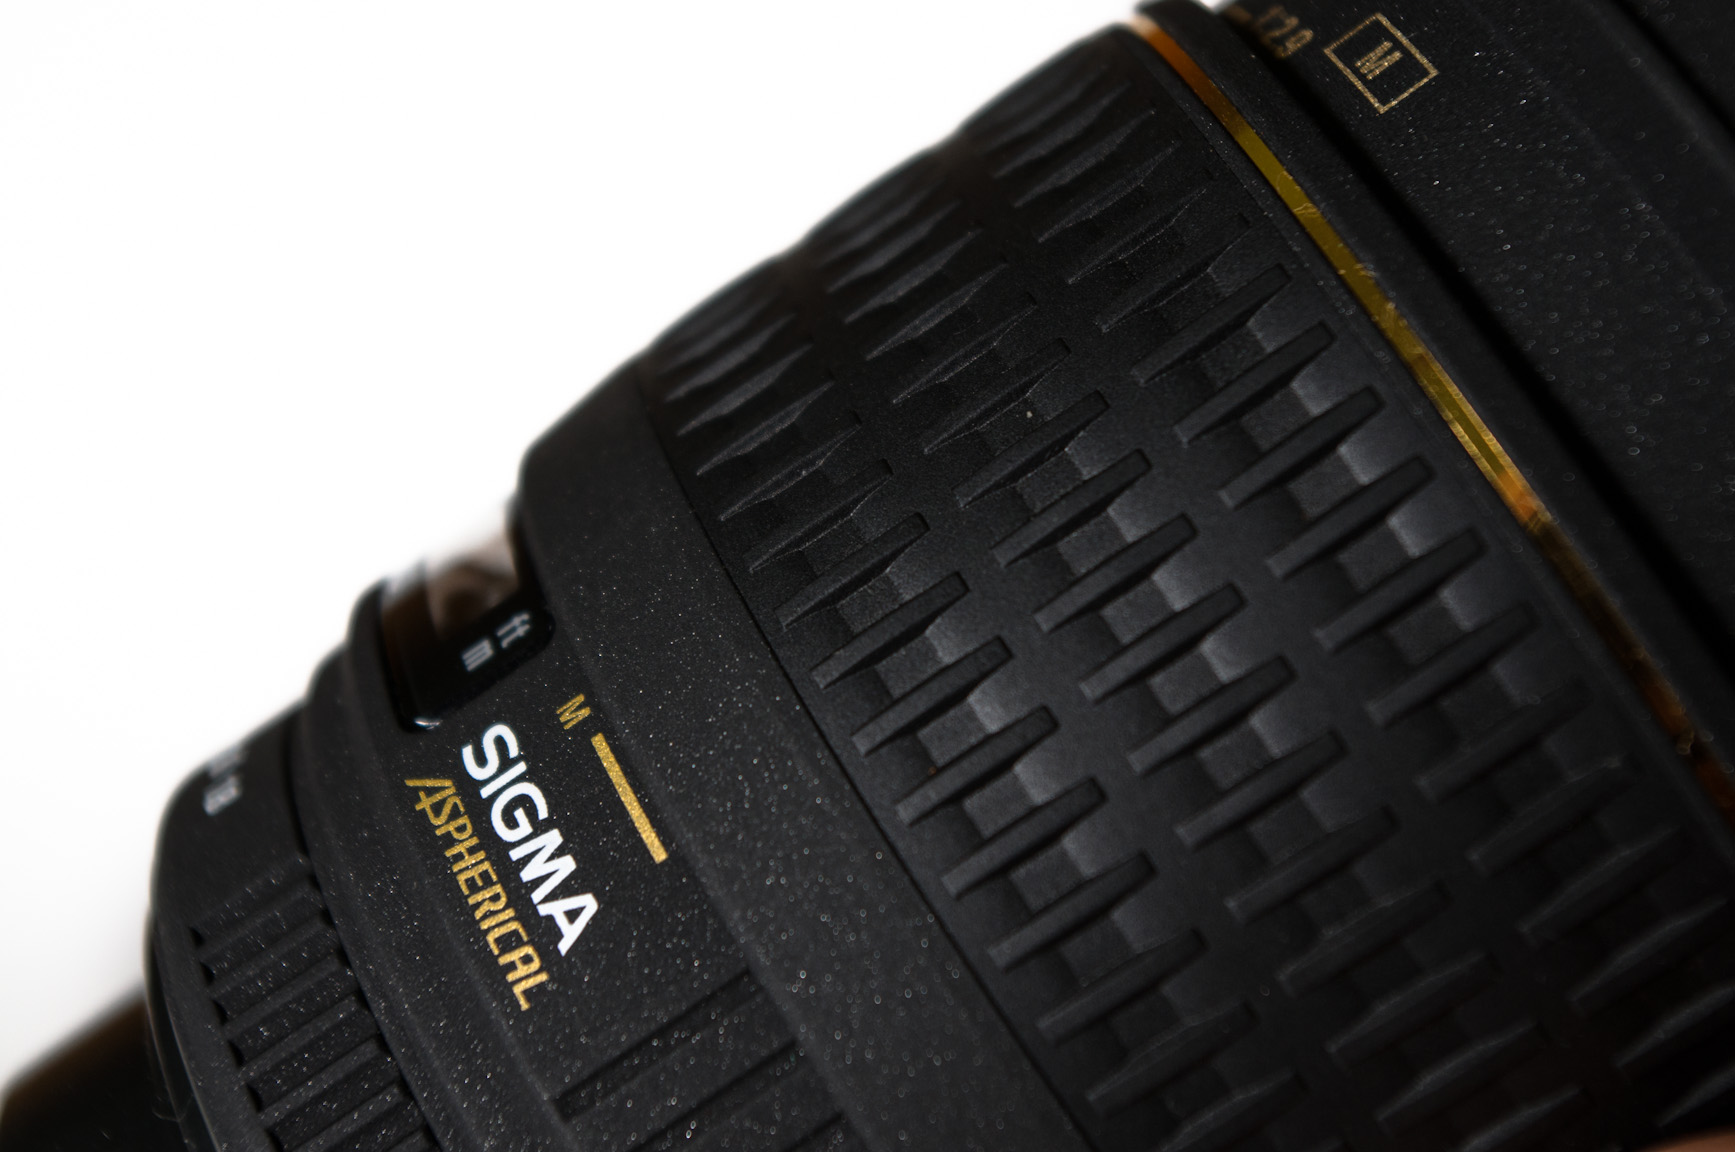 Sigma 28 mm f/1.8 EX DG Aspherical Macro – recenze objektivu